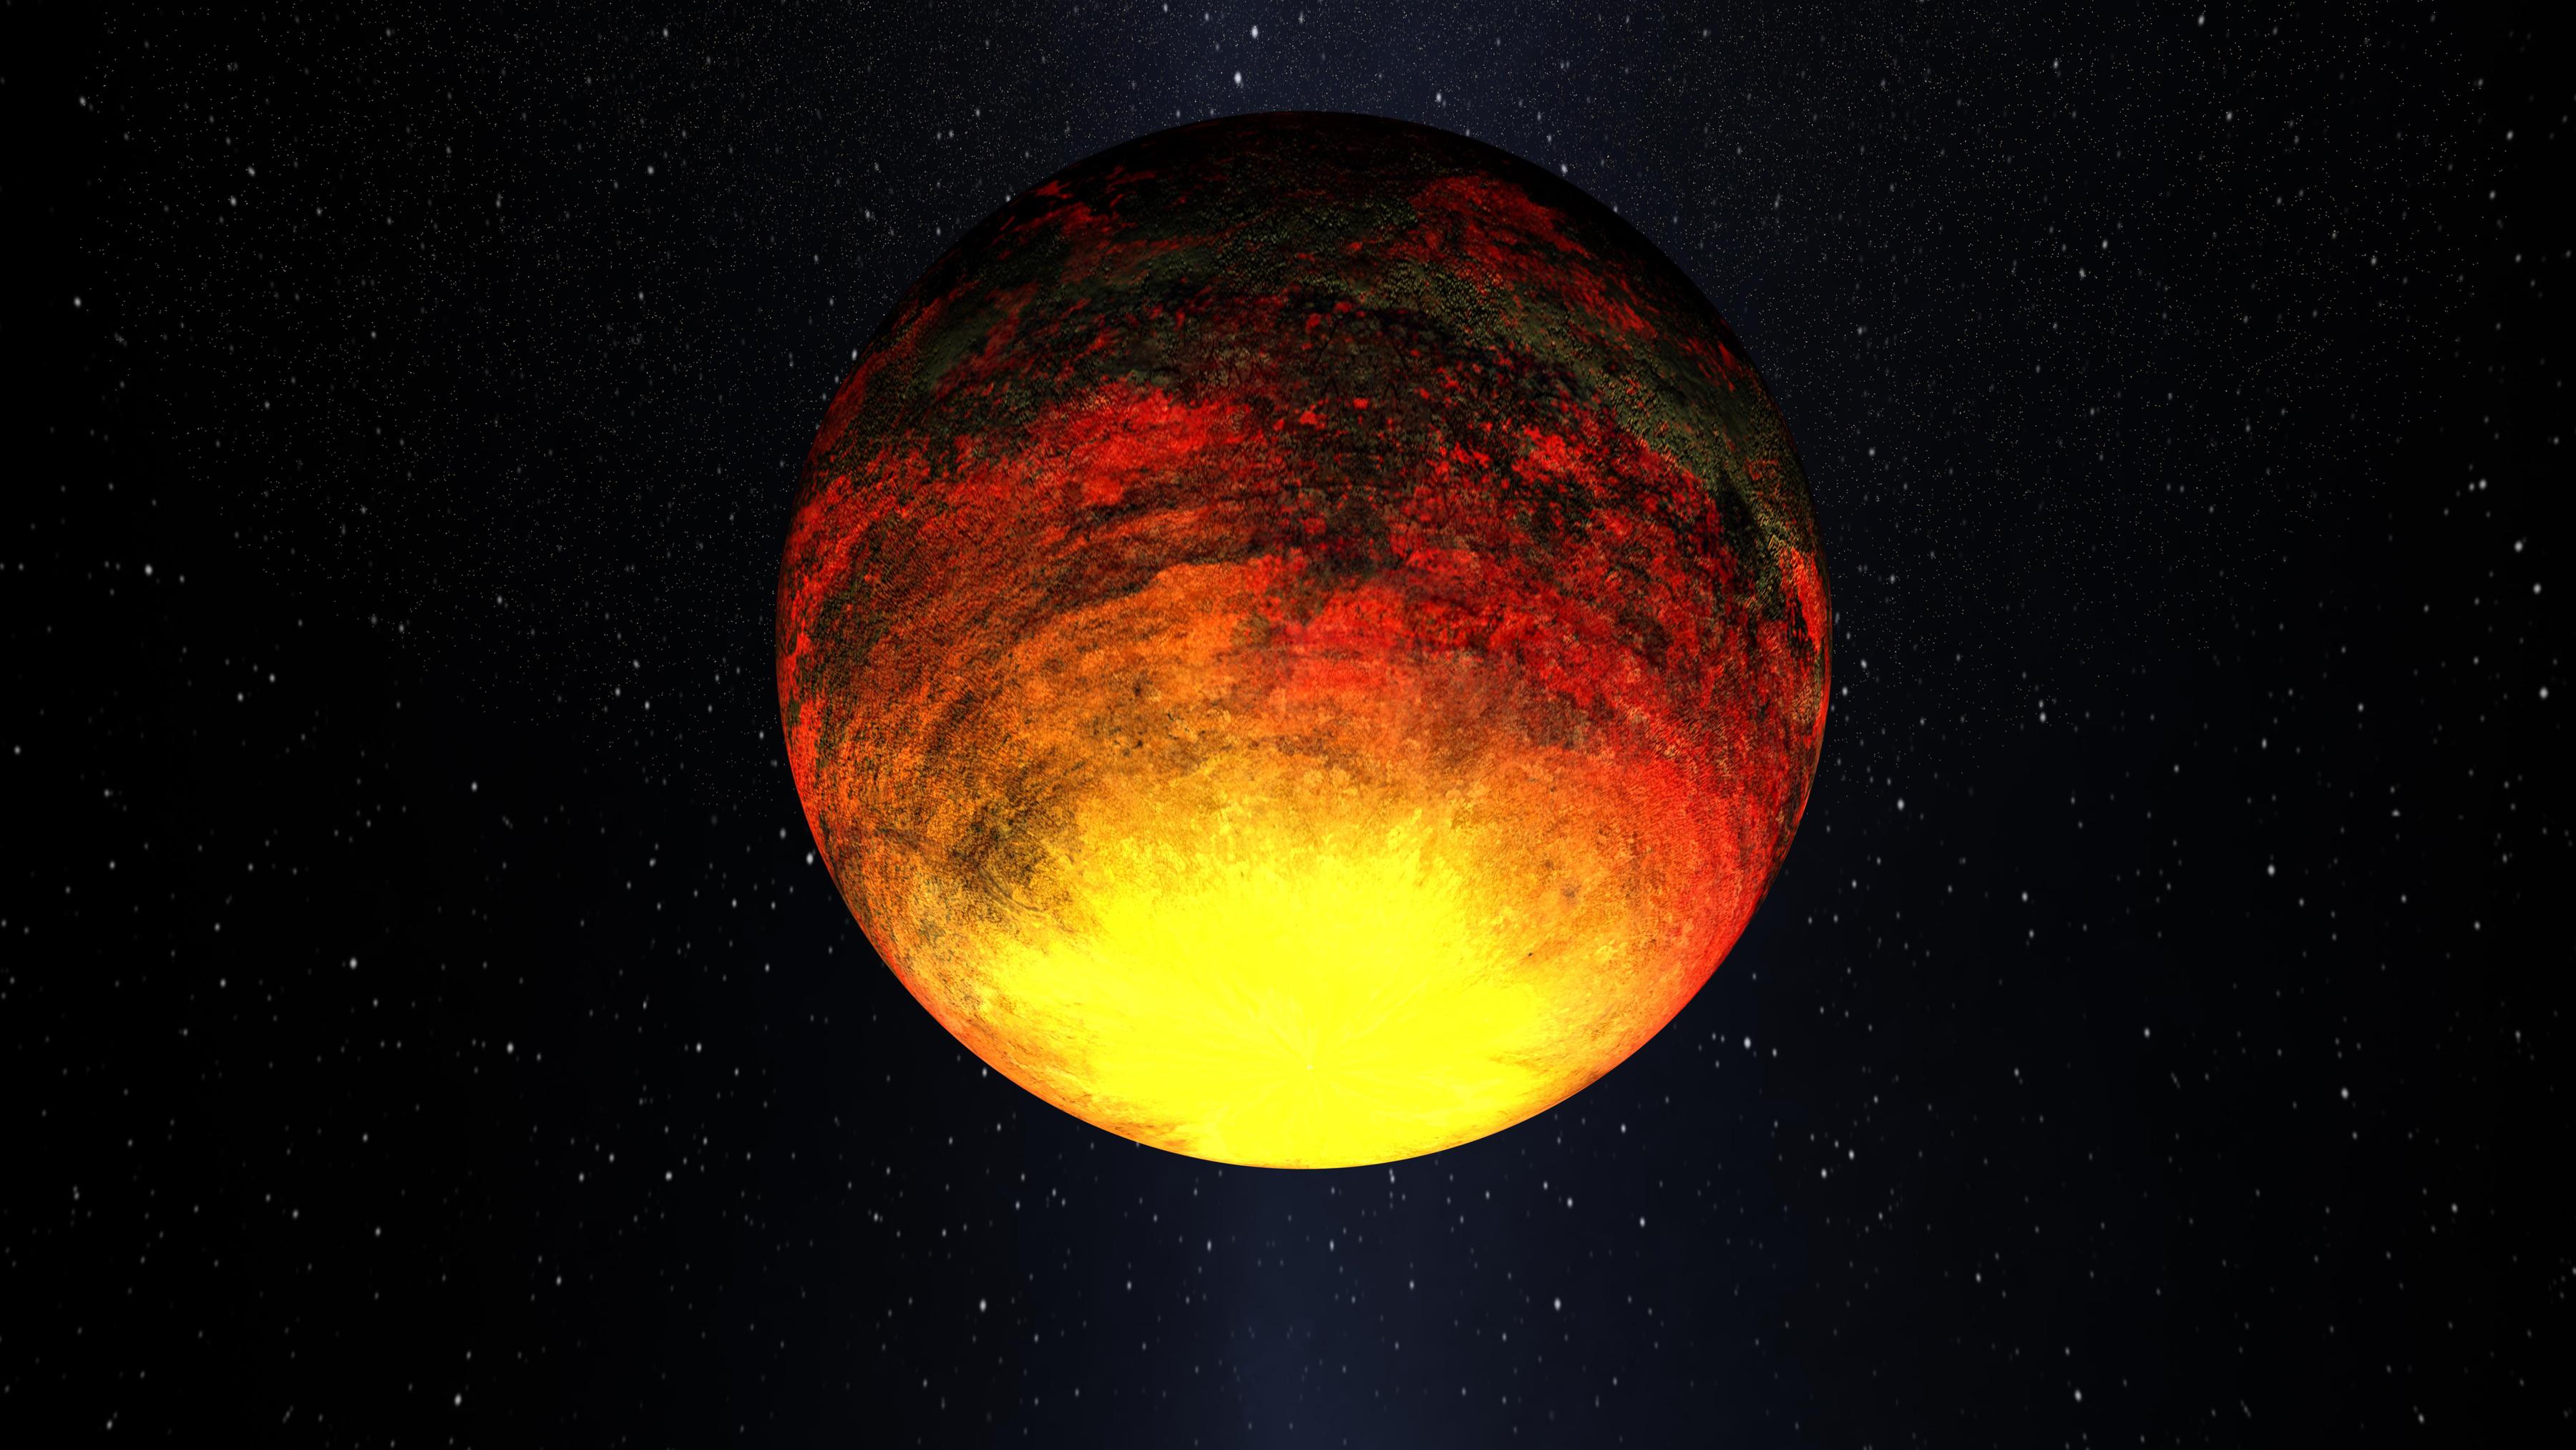 Artist's Depiction of Kepler-10b